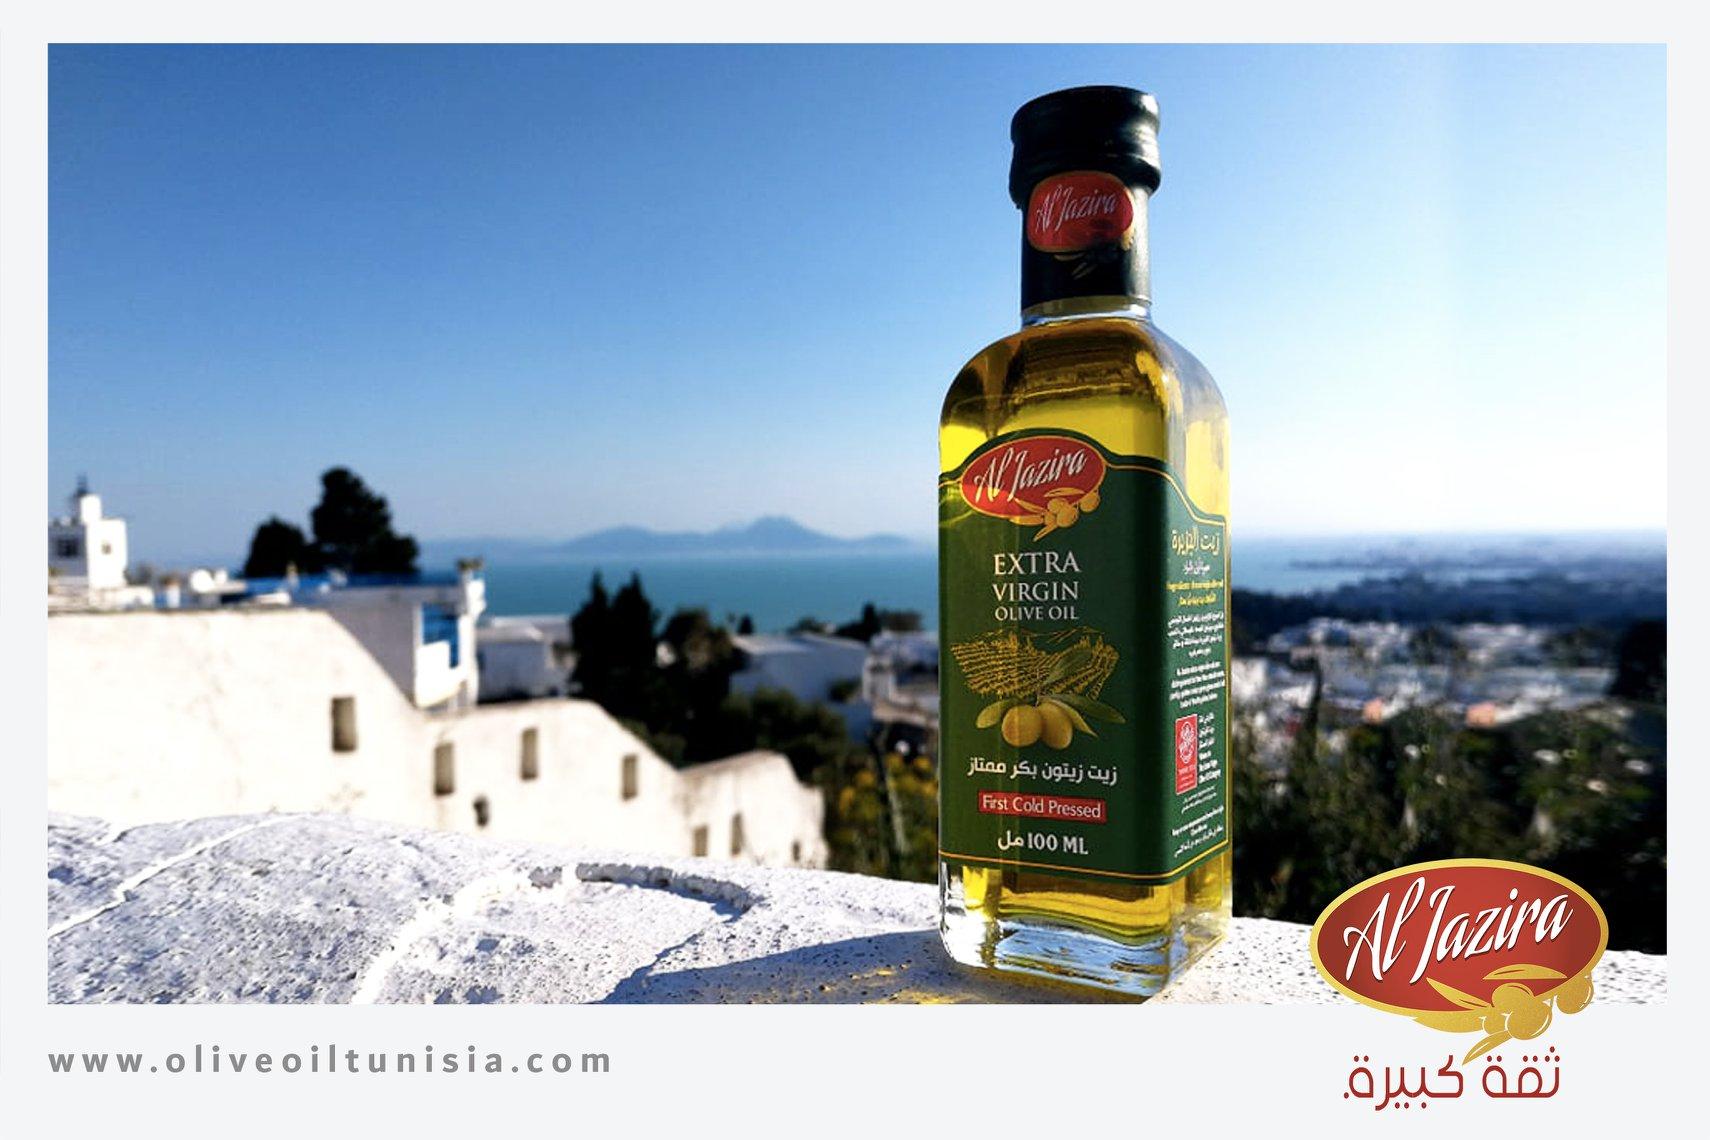 Al Jazira huile d olive